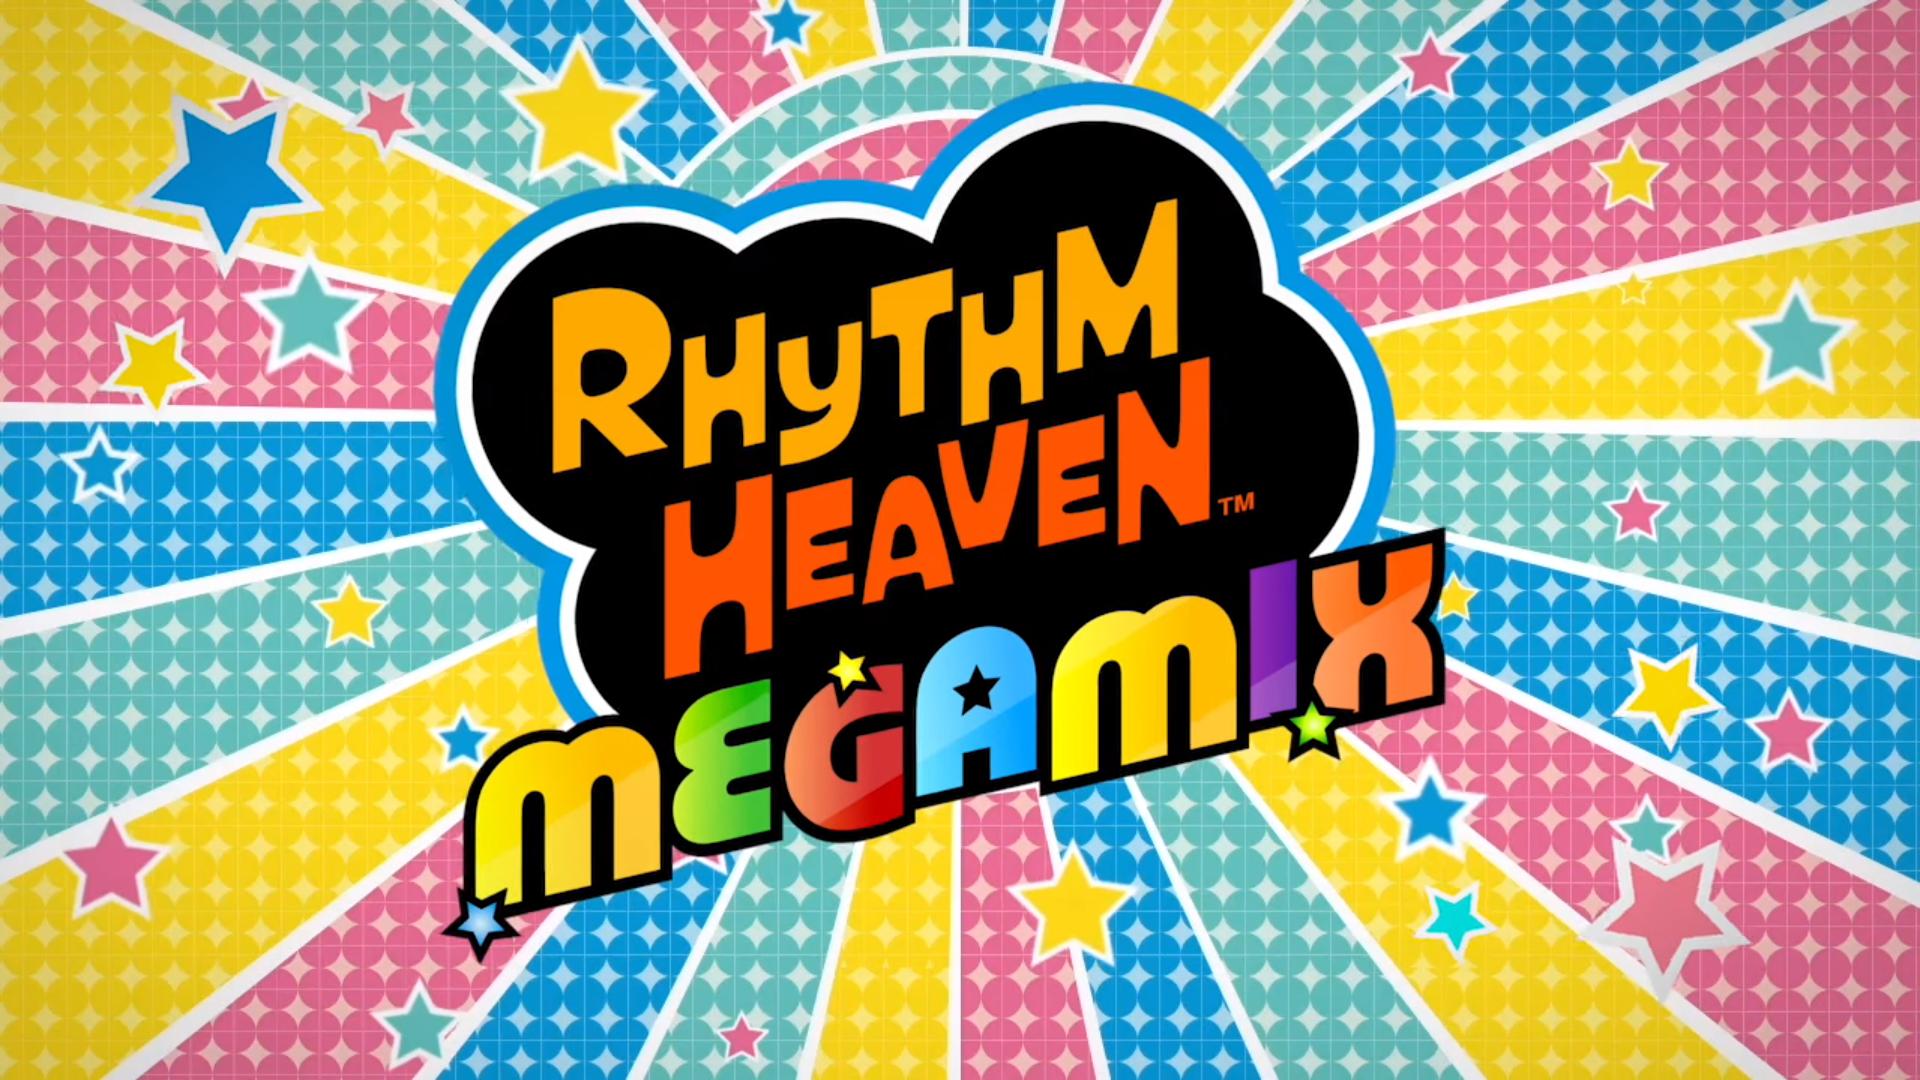 Image for Rhythm Heaven Megamix hits Nintendo eShop today. European release date announced